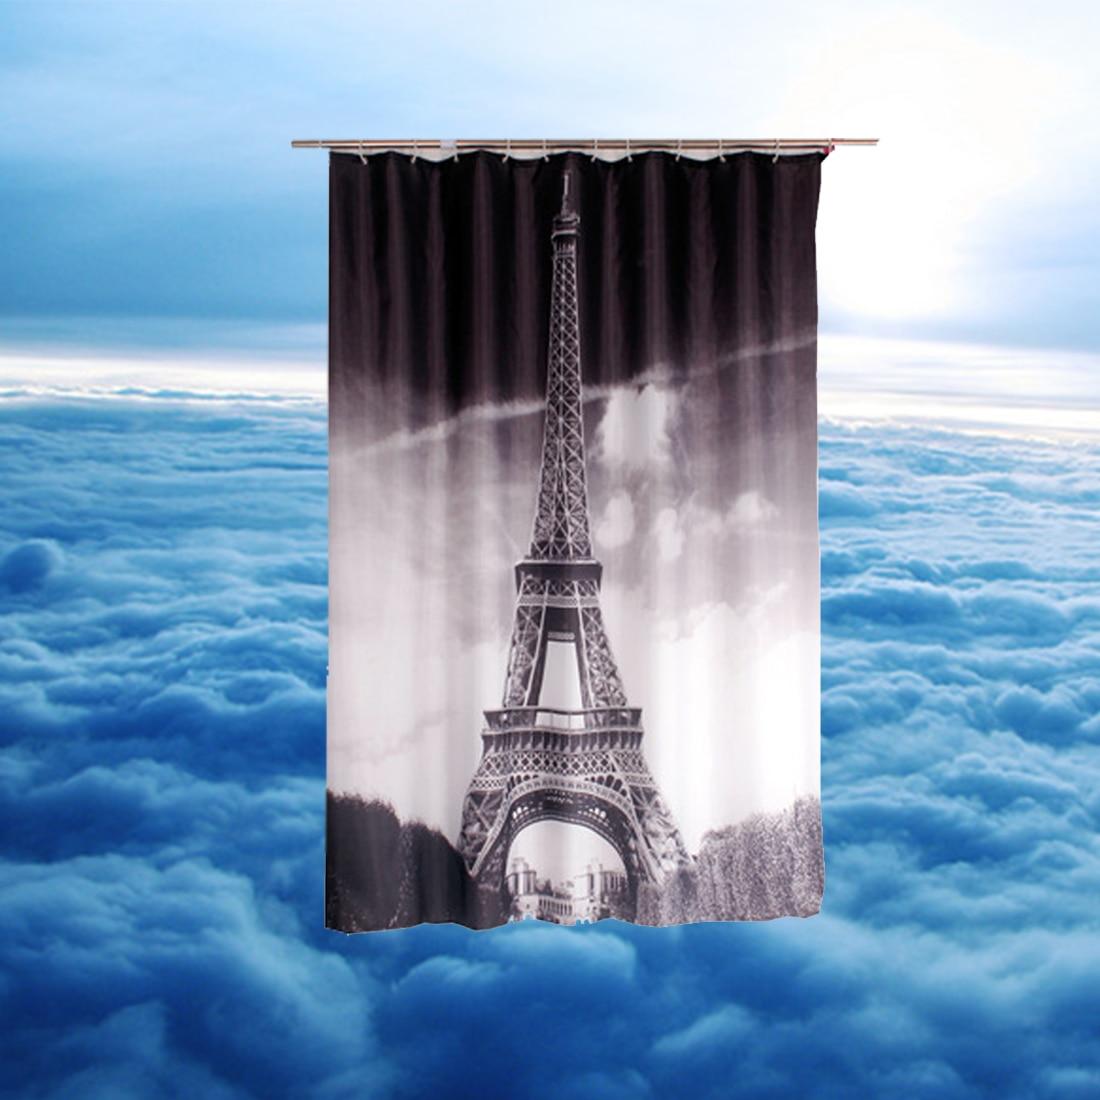 Fabric paris shower curtain - Paris Shower Curtains Design Water Resistance Fabric Polyester Waterproof Home Bathroom Curtains 1pcs 180 180cm